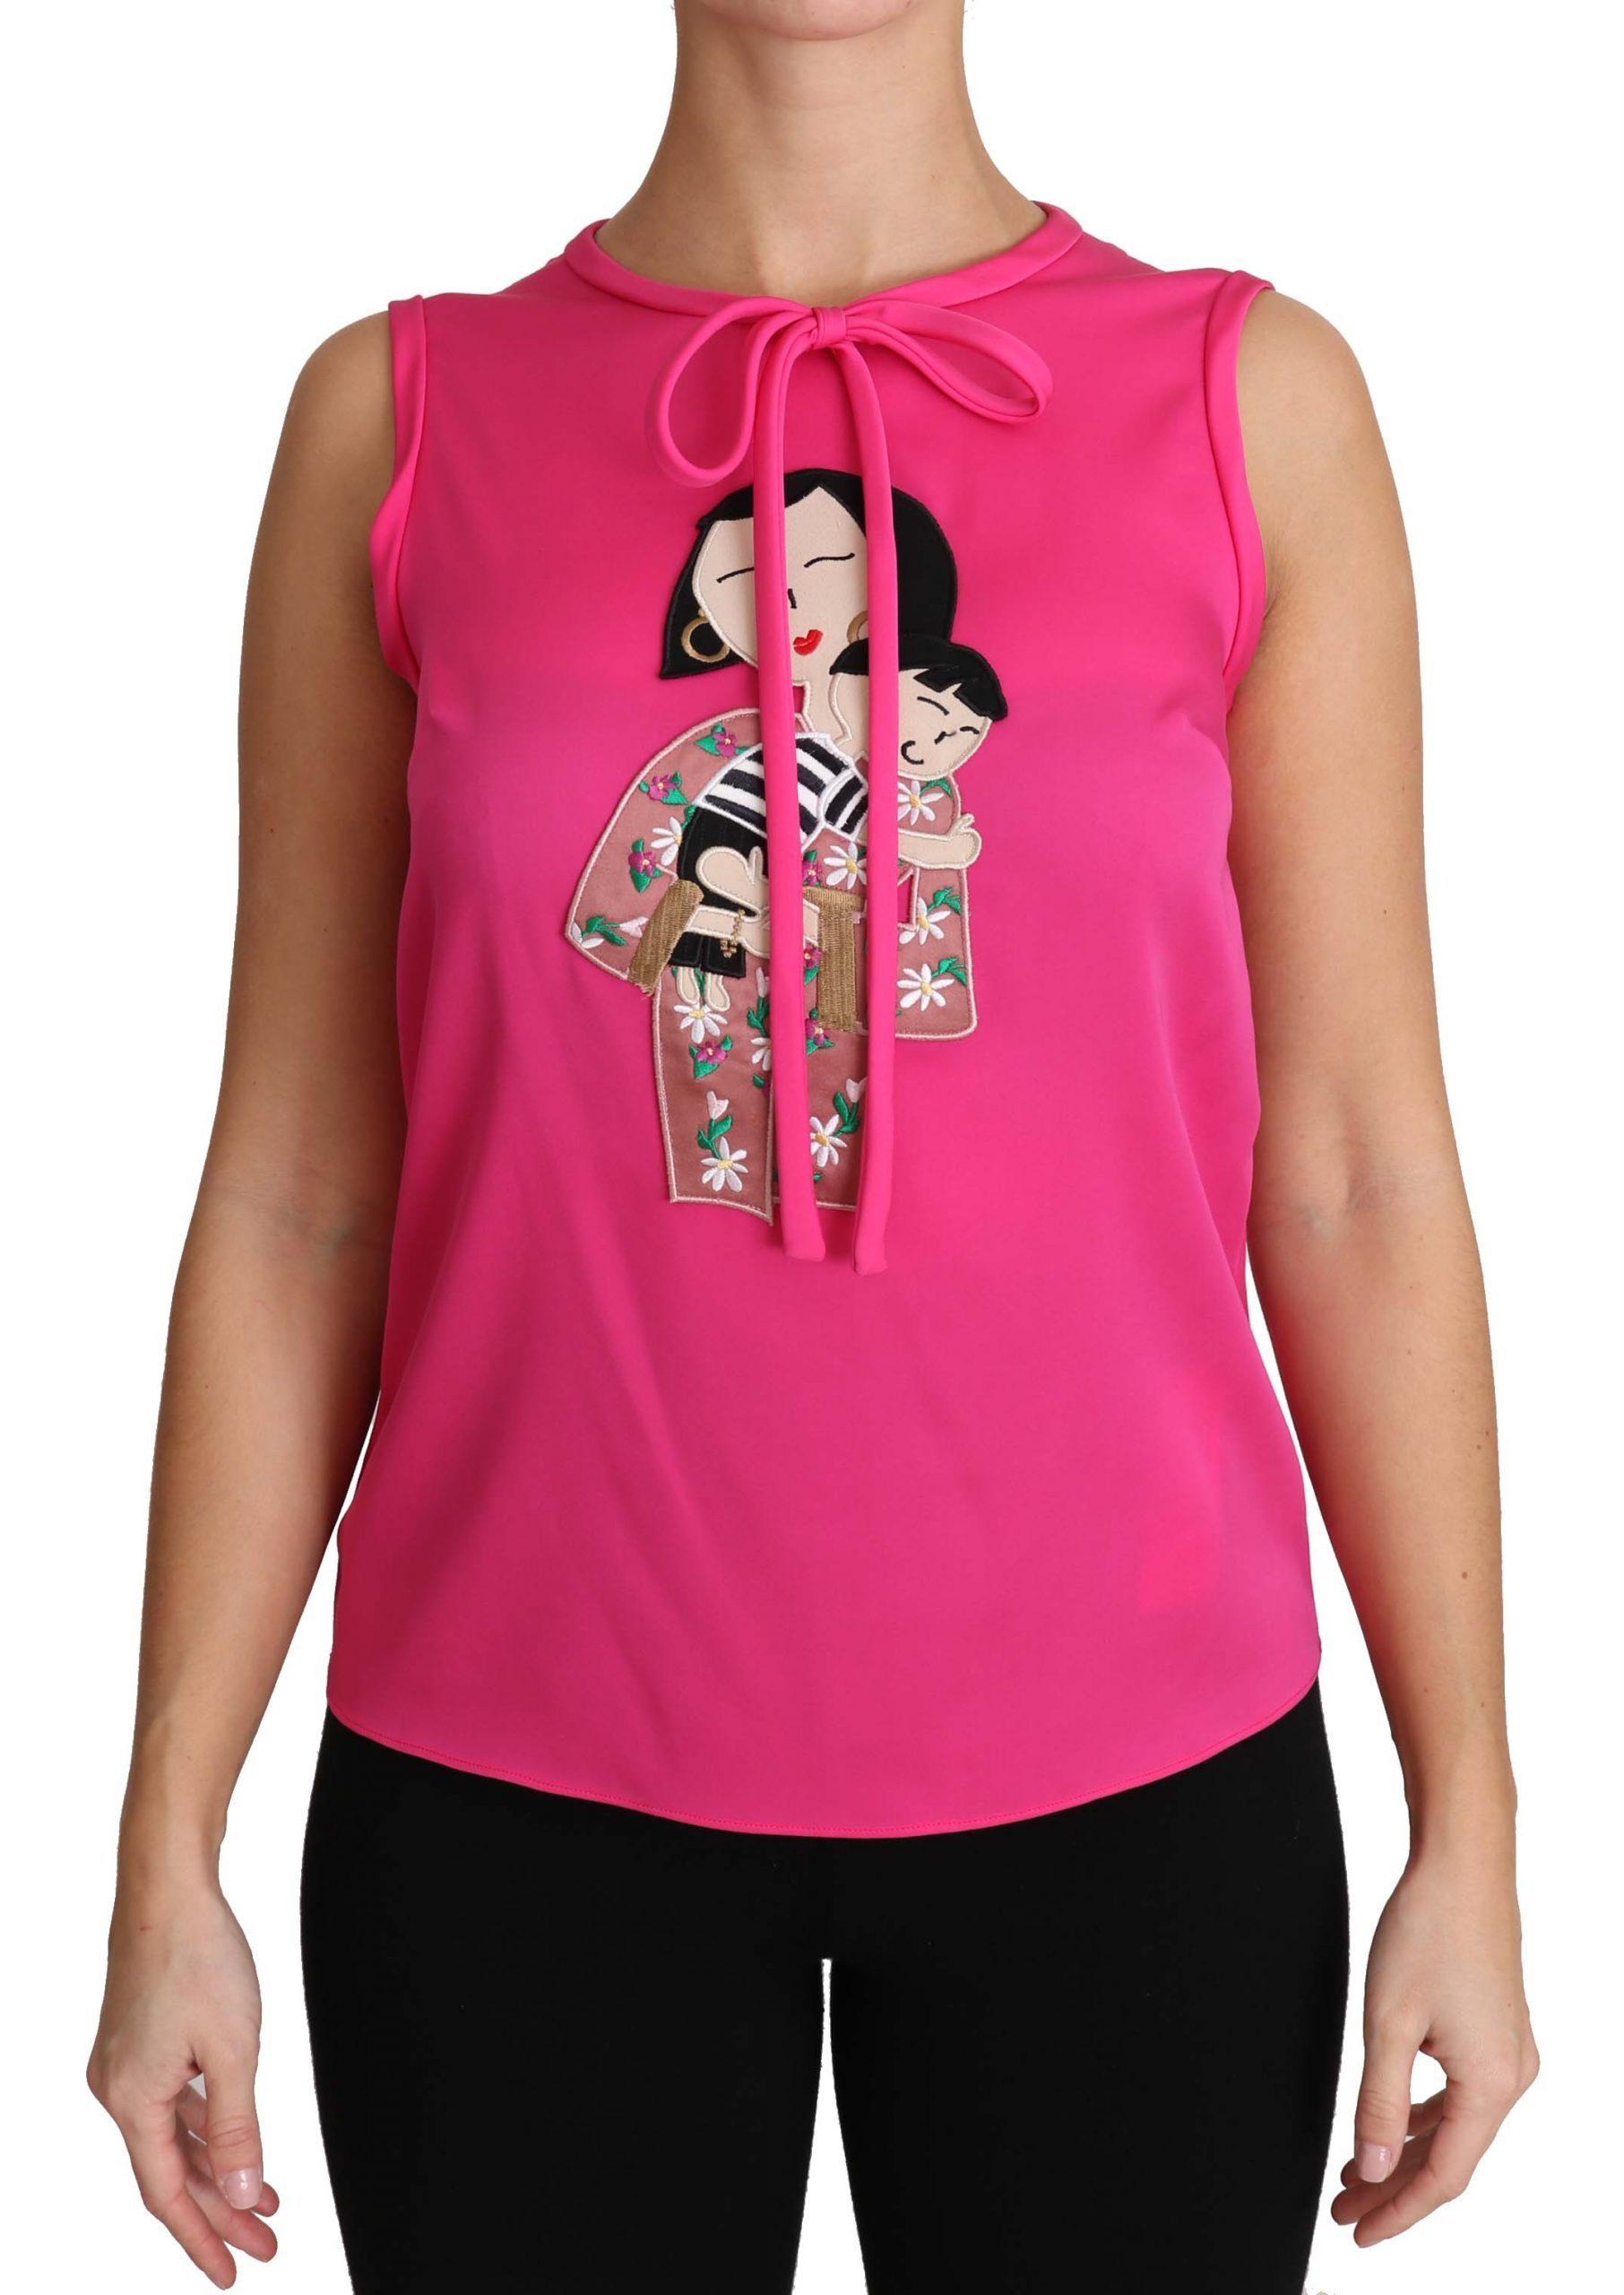 Dolce & Gabbana Women's Family Tops Pink TSH3161 - IT36 XXS